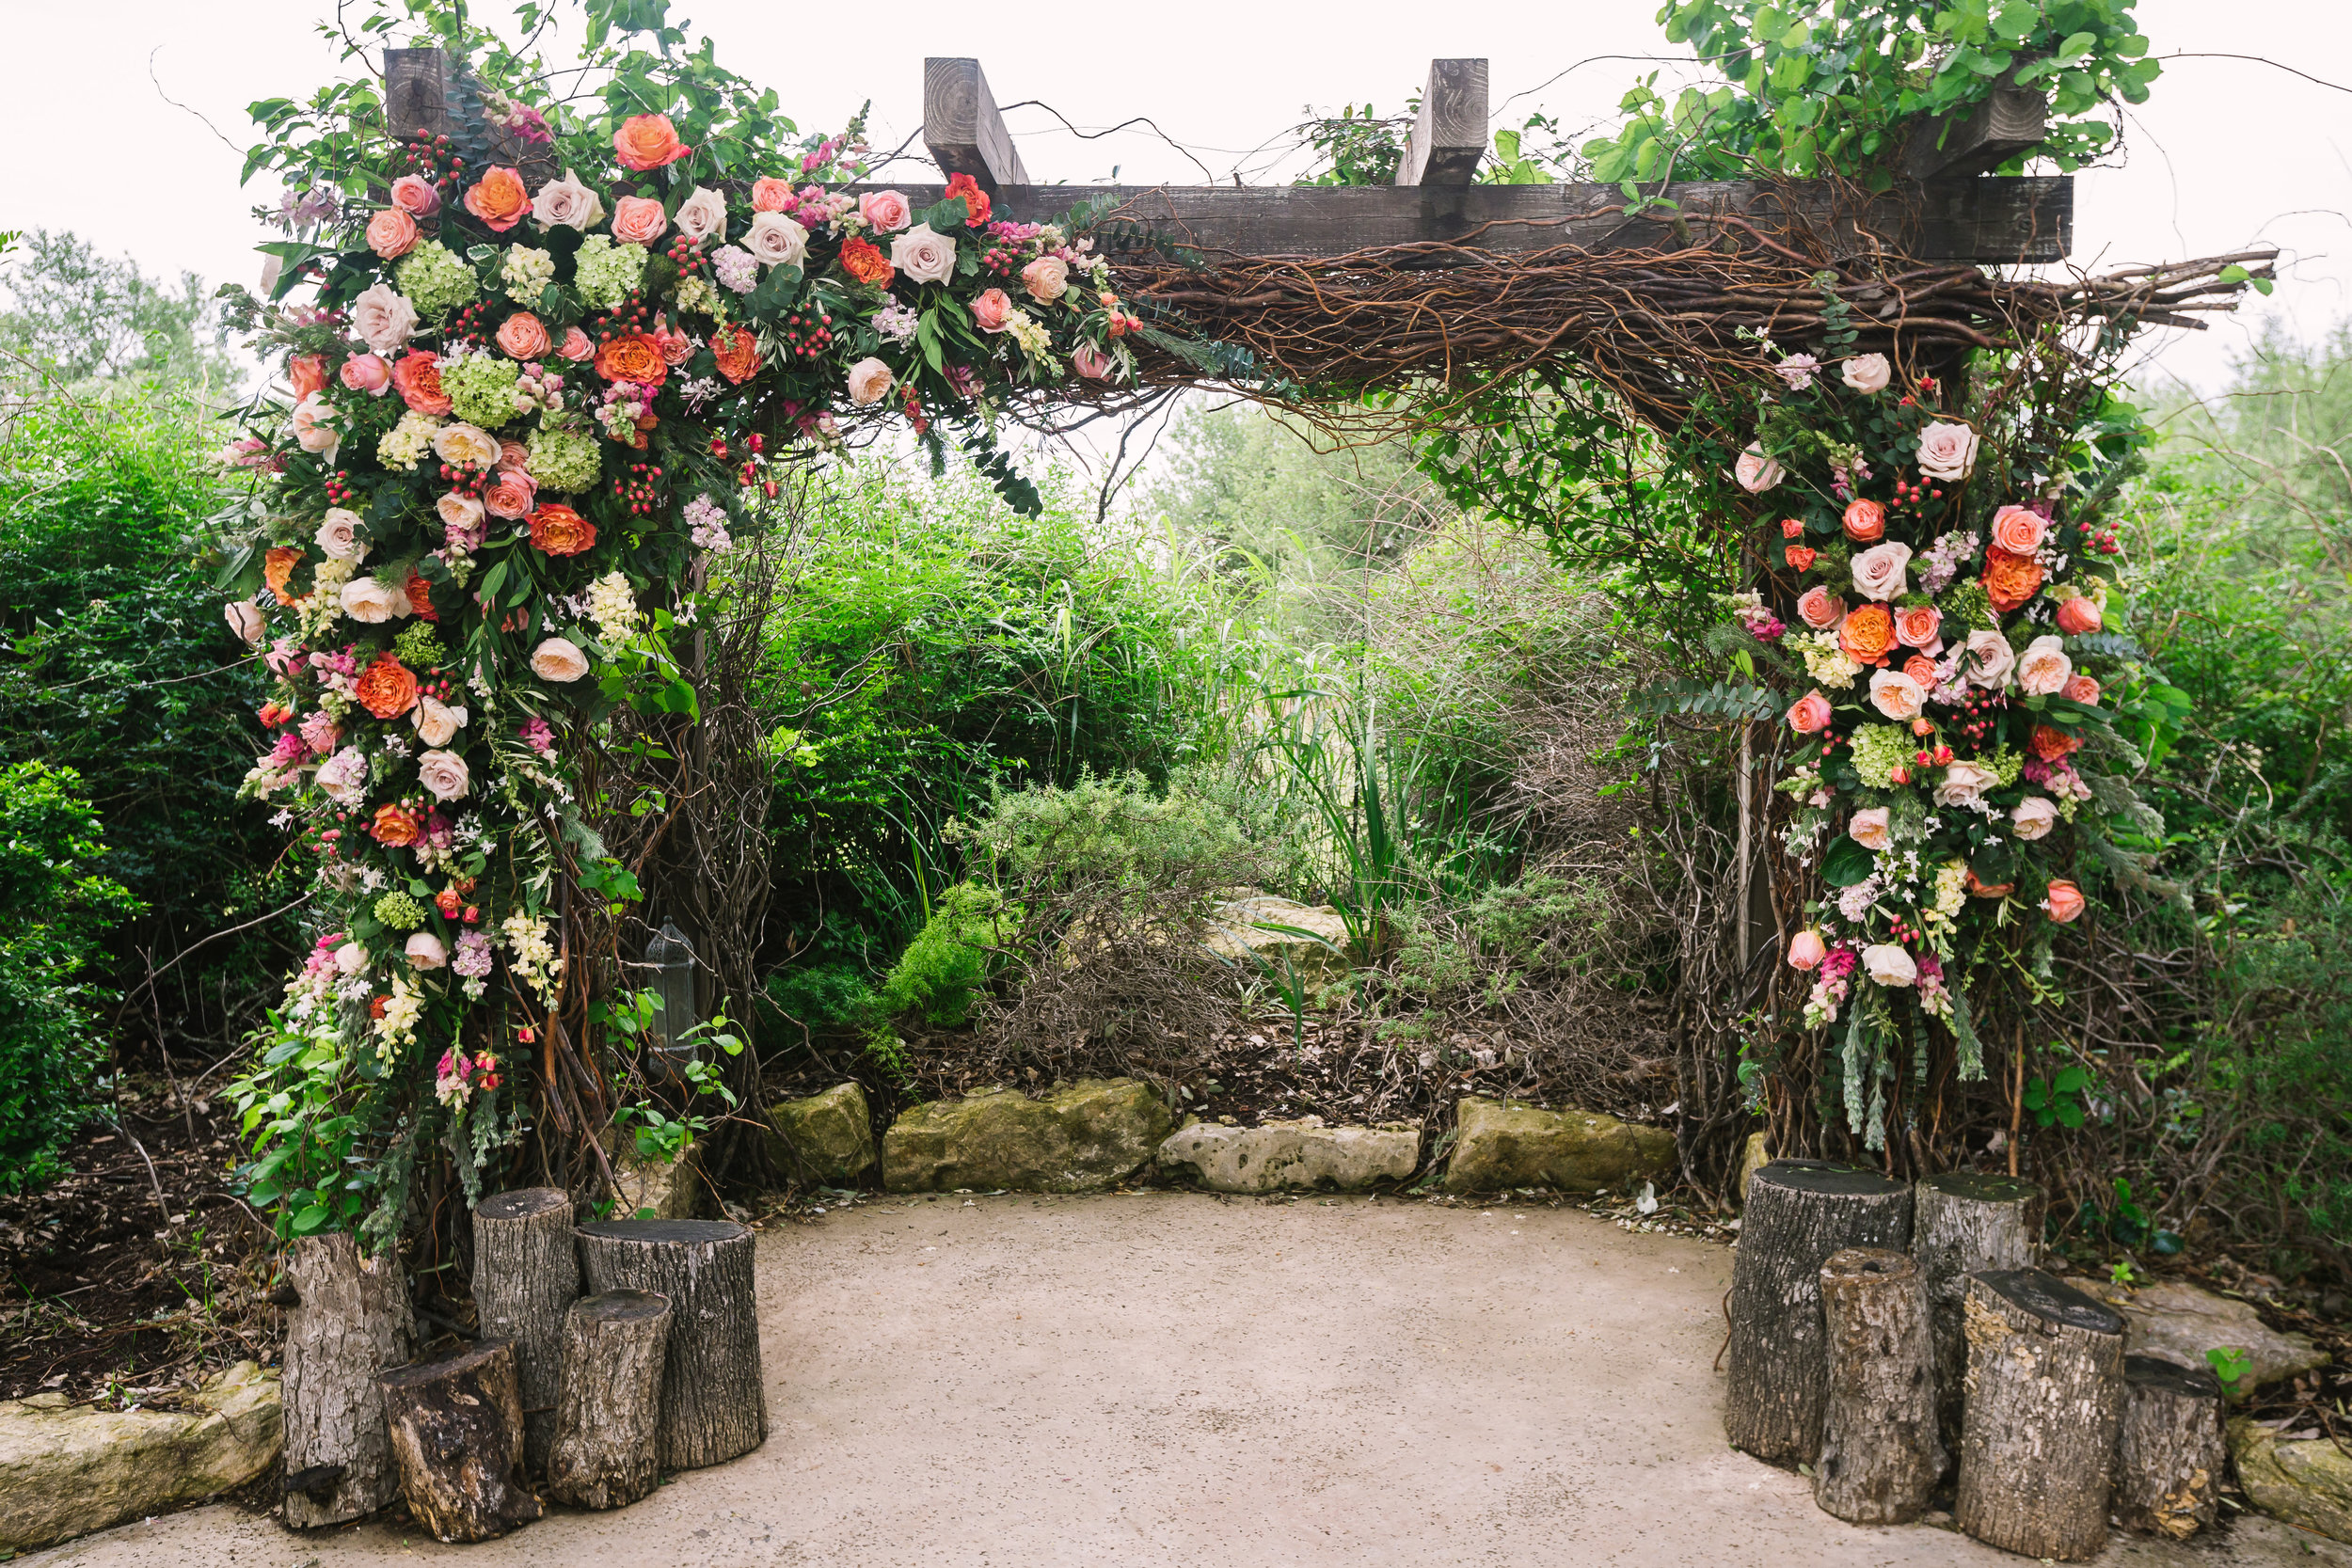 vista-west-ranch-texas-wedding-destination-austin-texas-petal-pushers-flowers-bird-and-the-bear